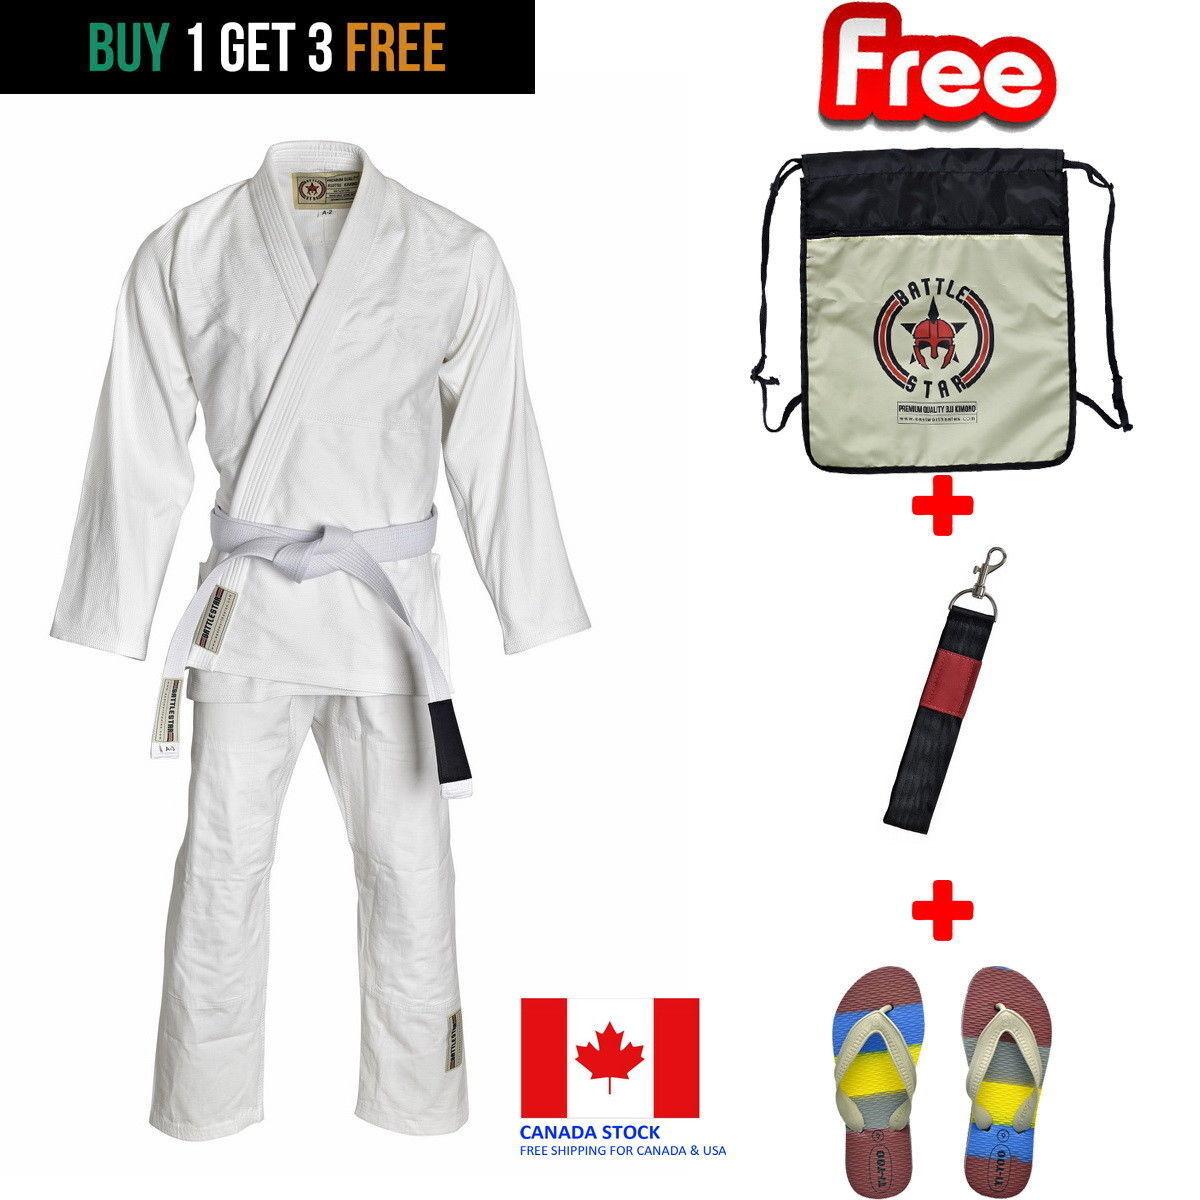 White BJJ Kids Fit GI   350 GSM Pearlweave  Ripstop Brazilian Jiu-jitsu Kimono  considerate service